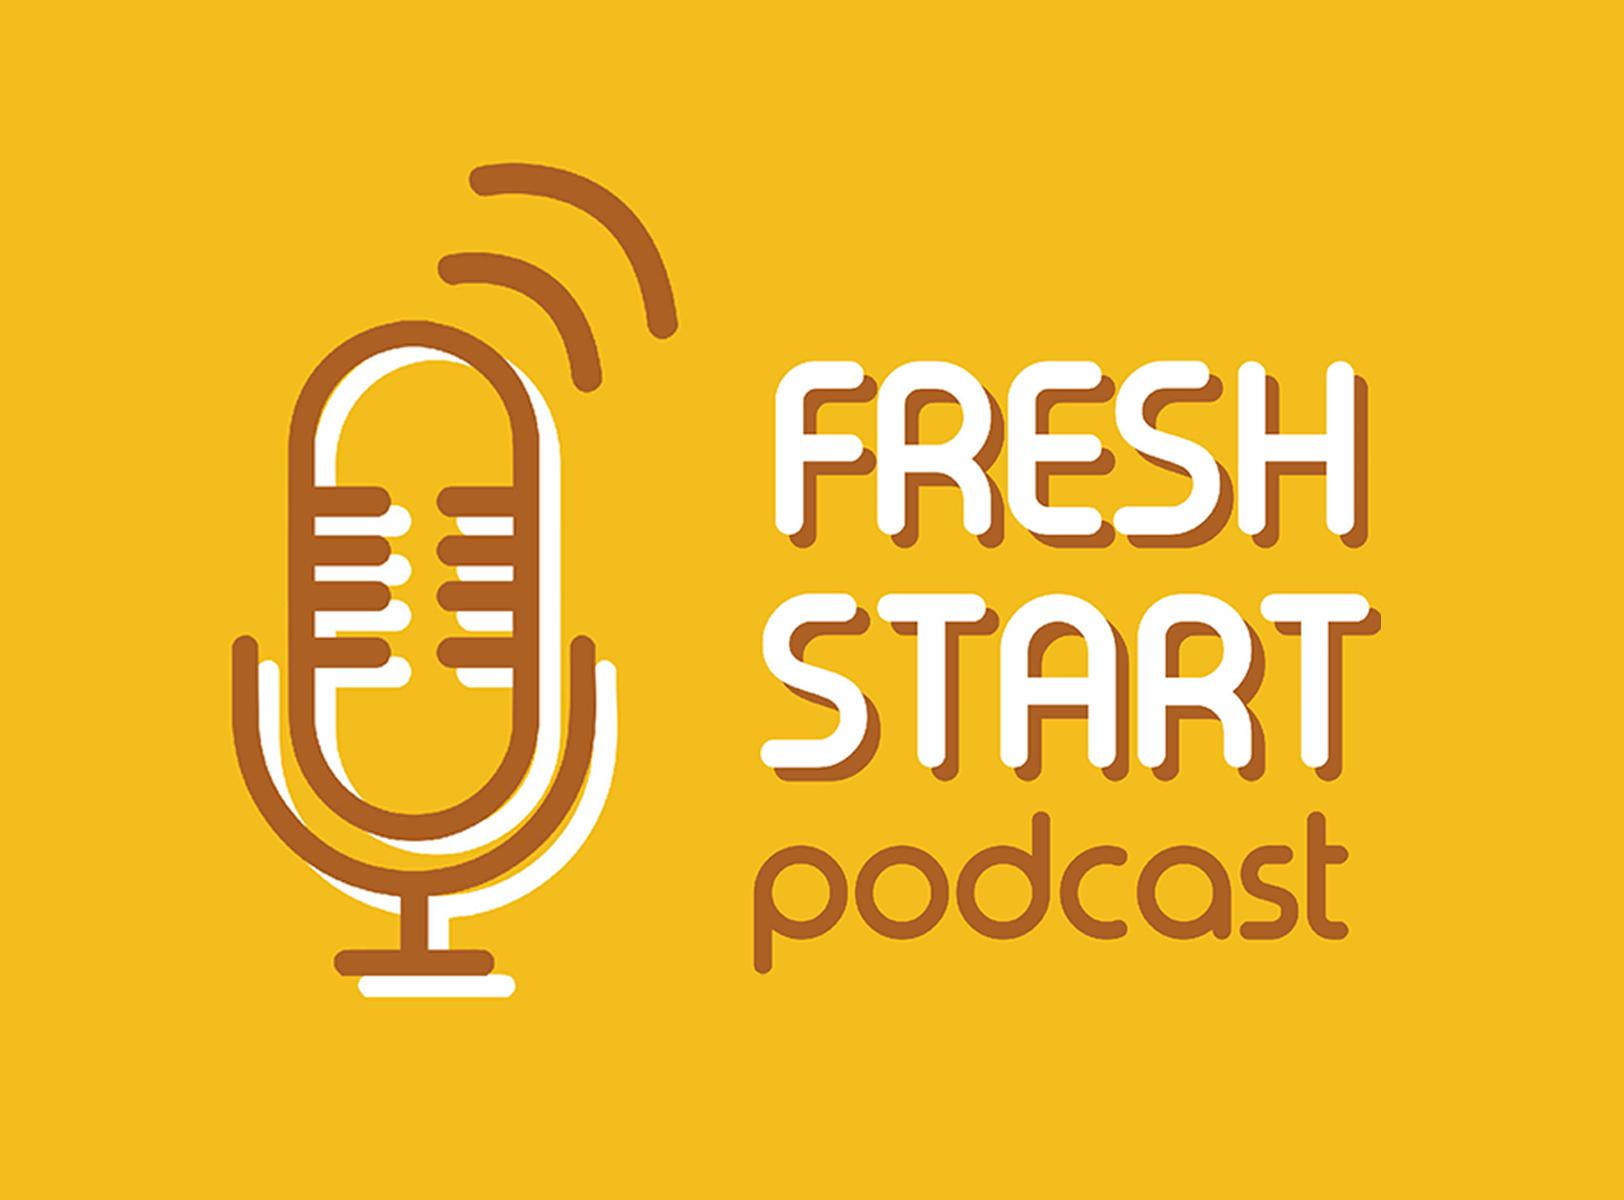 Fresh Start: Podcast News (2/18/2019 Mon.)